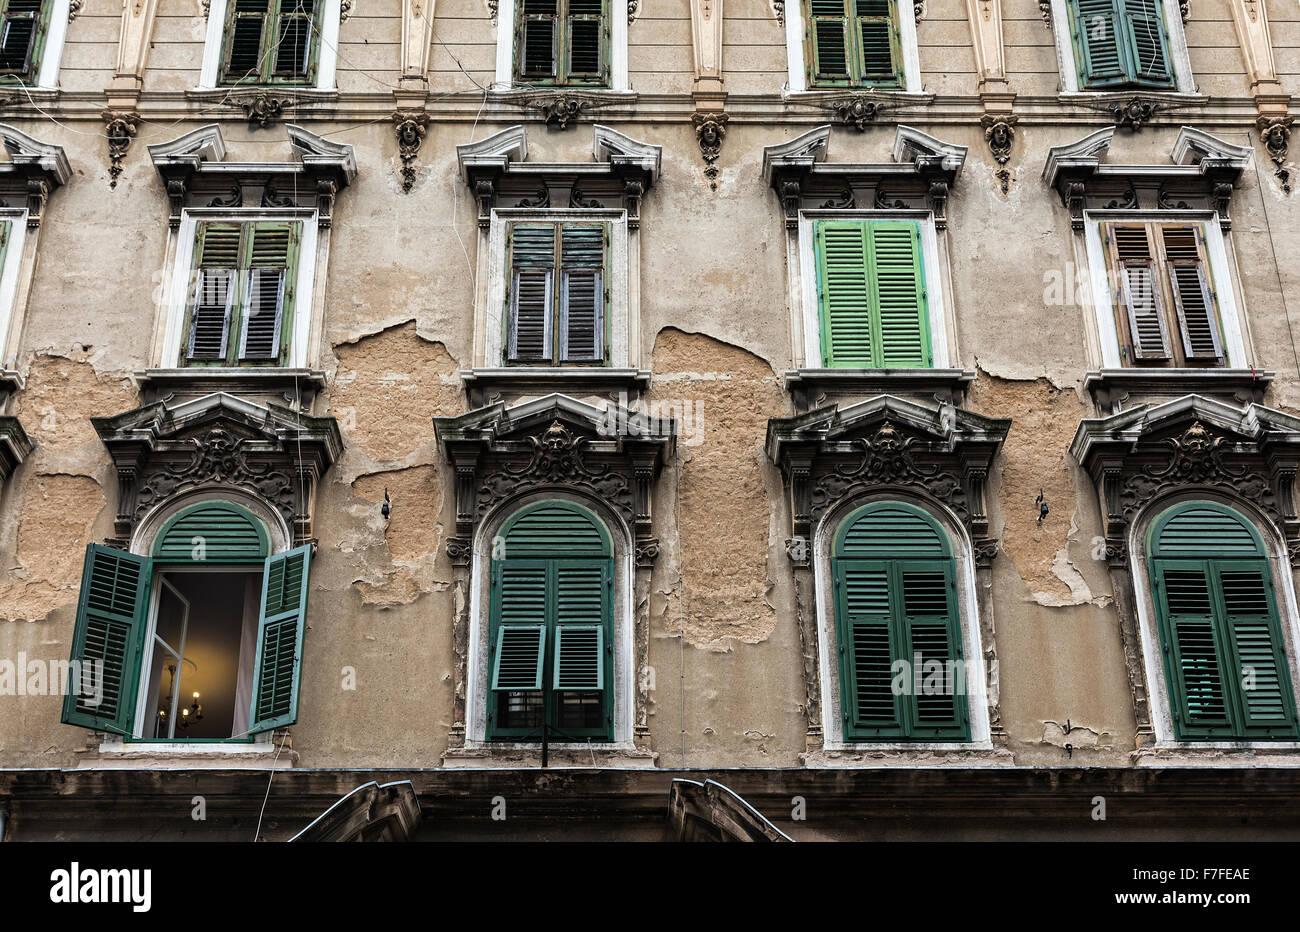 Fassade mit Fensterläden, Rijeka, Kroatien Stockbild